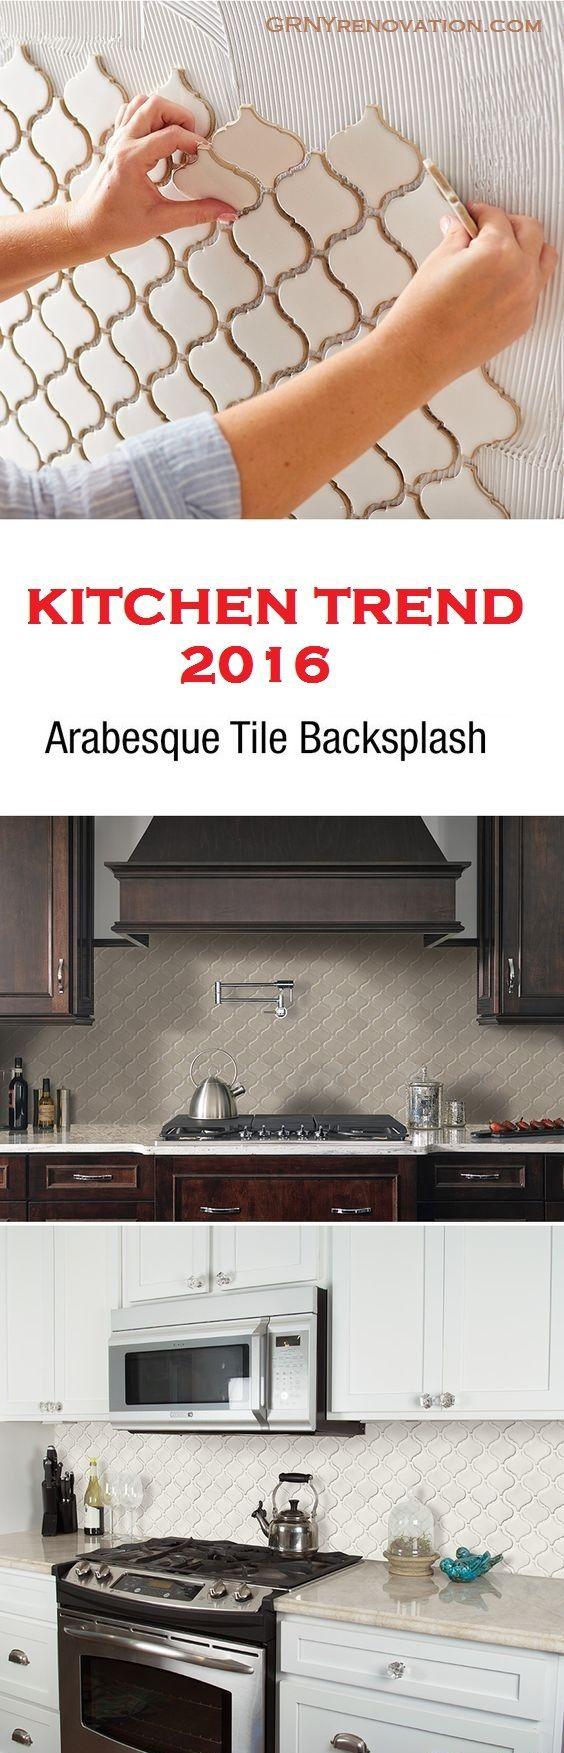 252 best kitchen design ideas images on pinterest dream kitchens kitchen update innovative design arabesque tile design follow our board